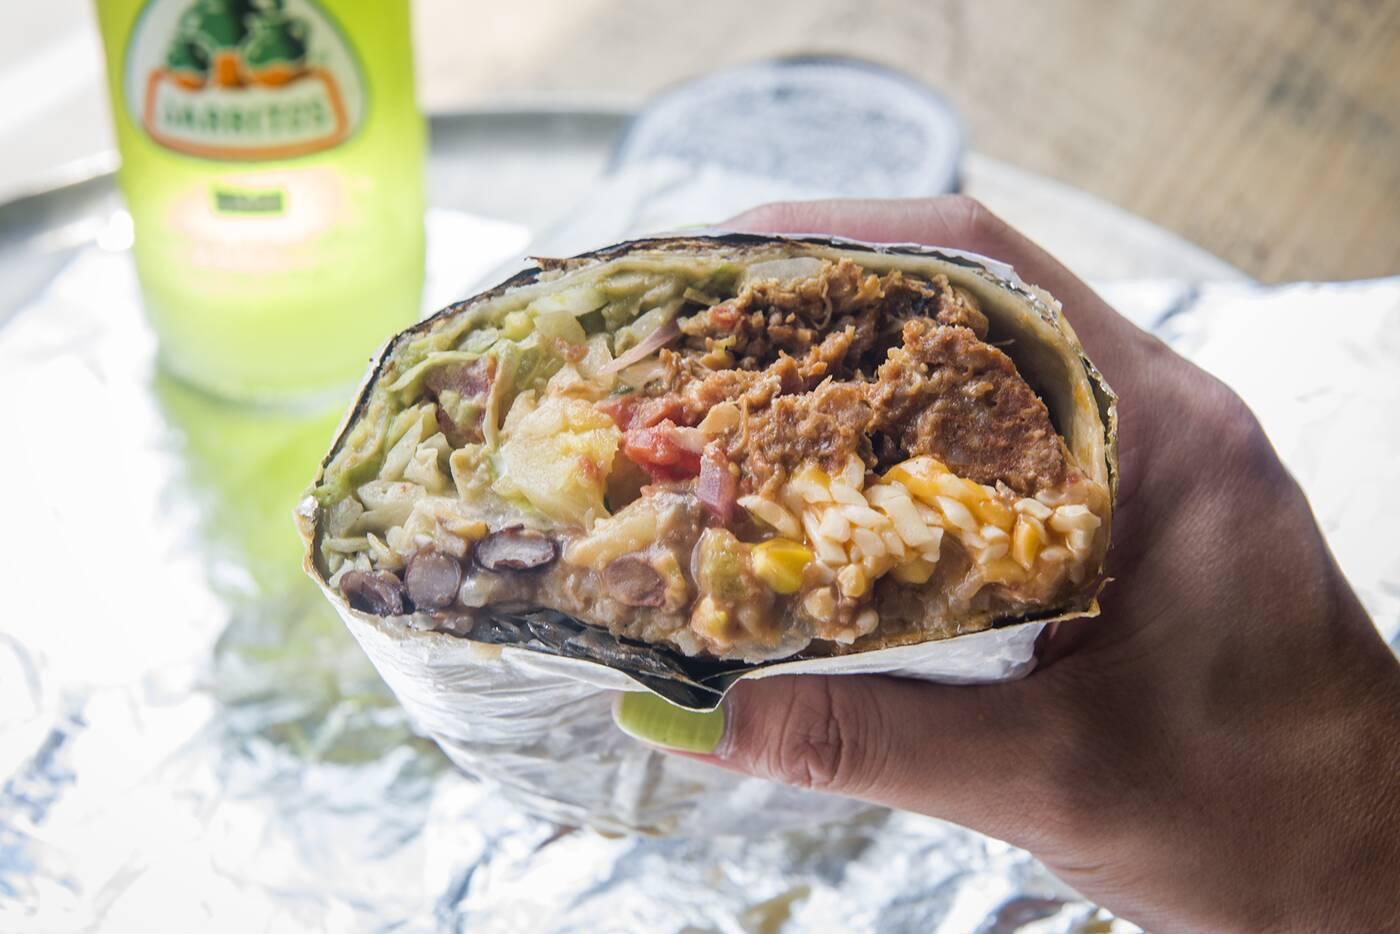 bang bang burrito toronto